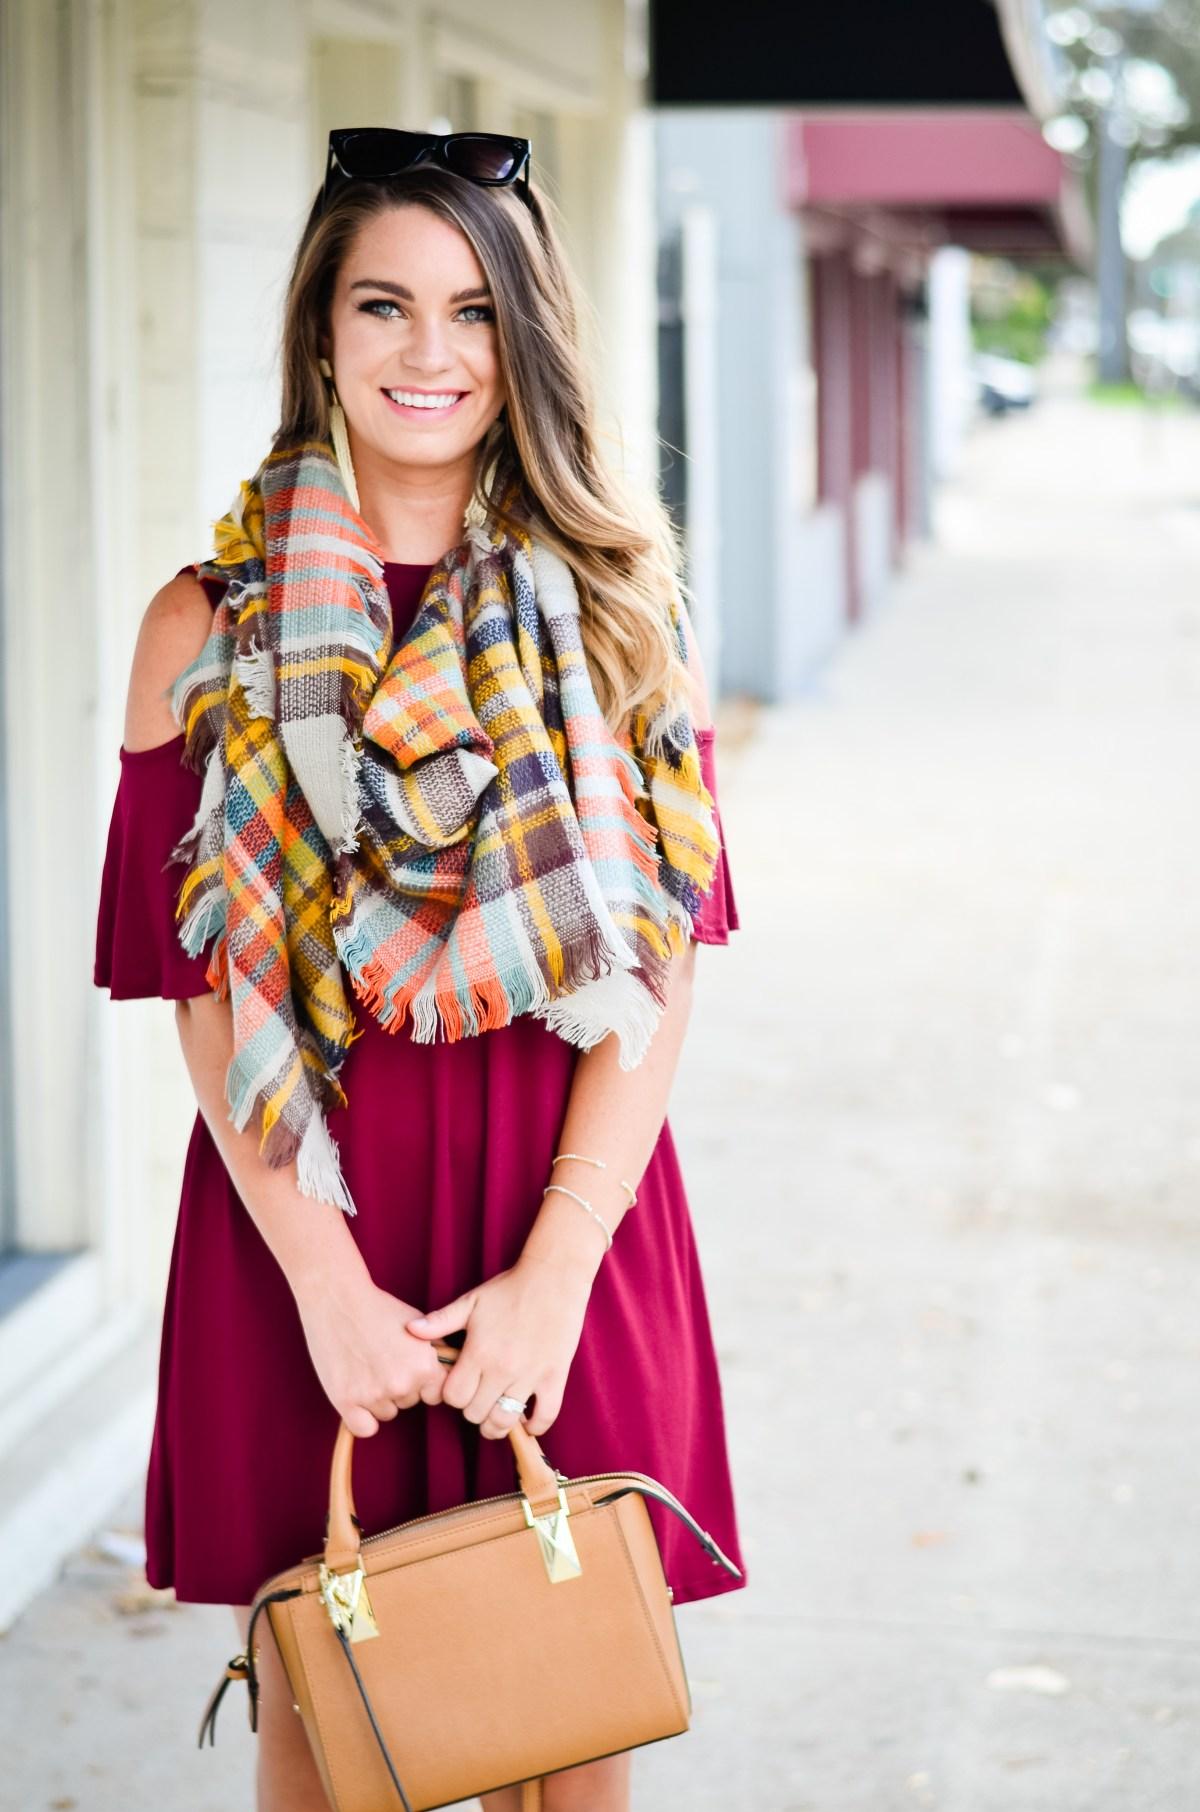 maroon-dress-blanket-scarf-goldfinch-19